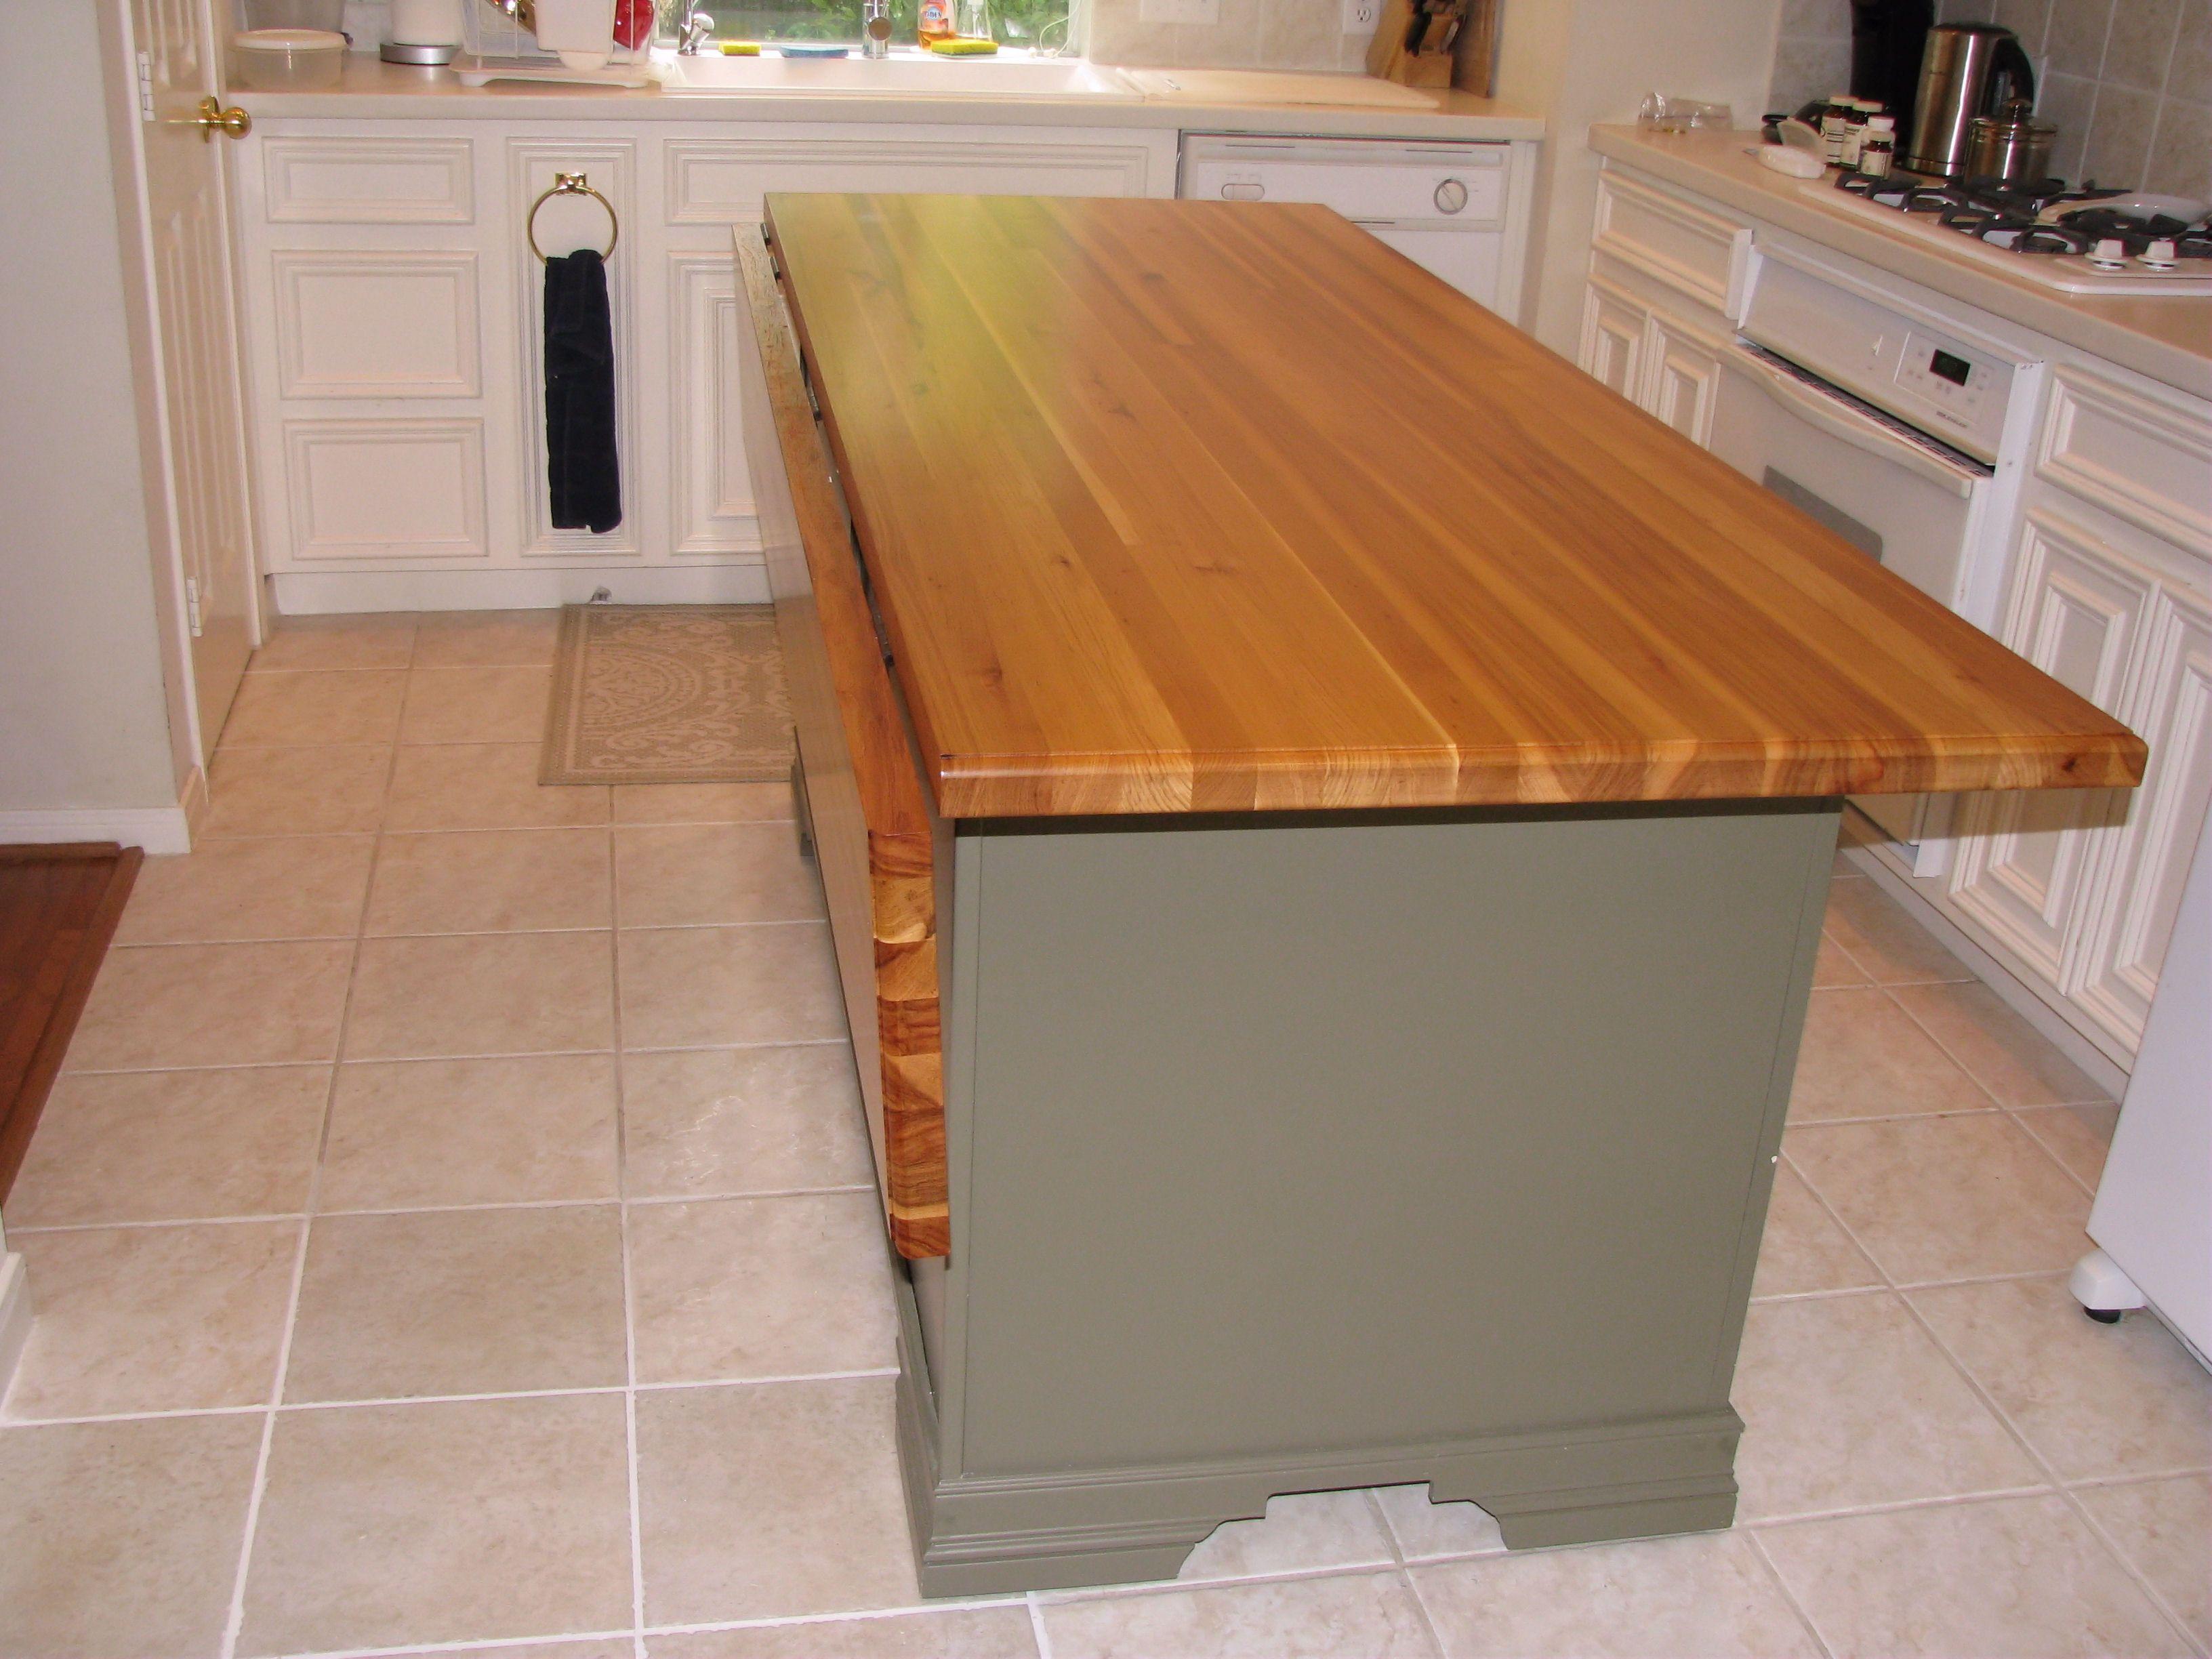 Pecan Wood Countertop Photo Gallery Small Kitchen Island Custom Kitchen Island Kitchen Island Design